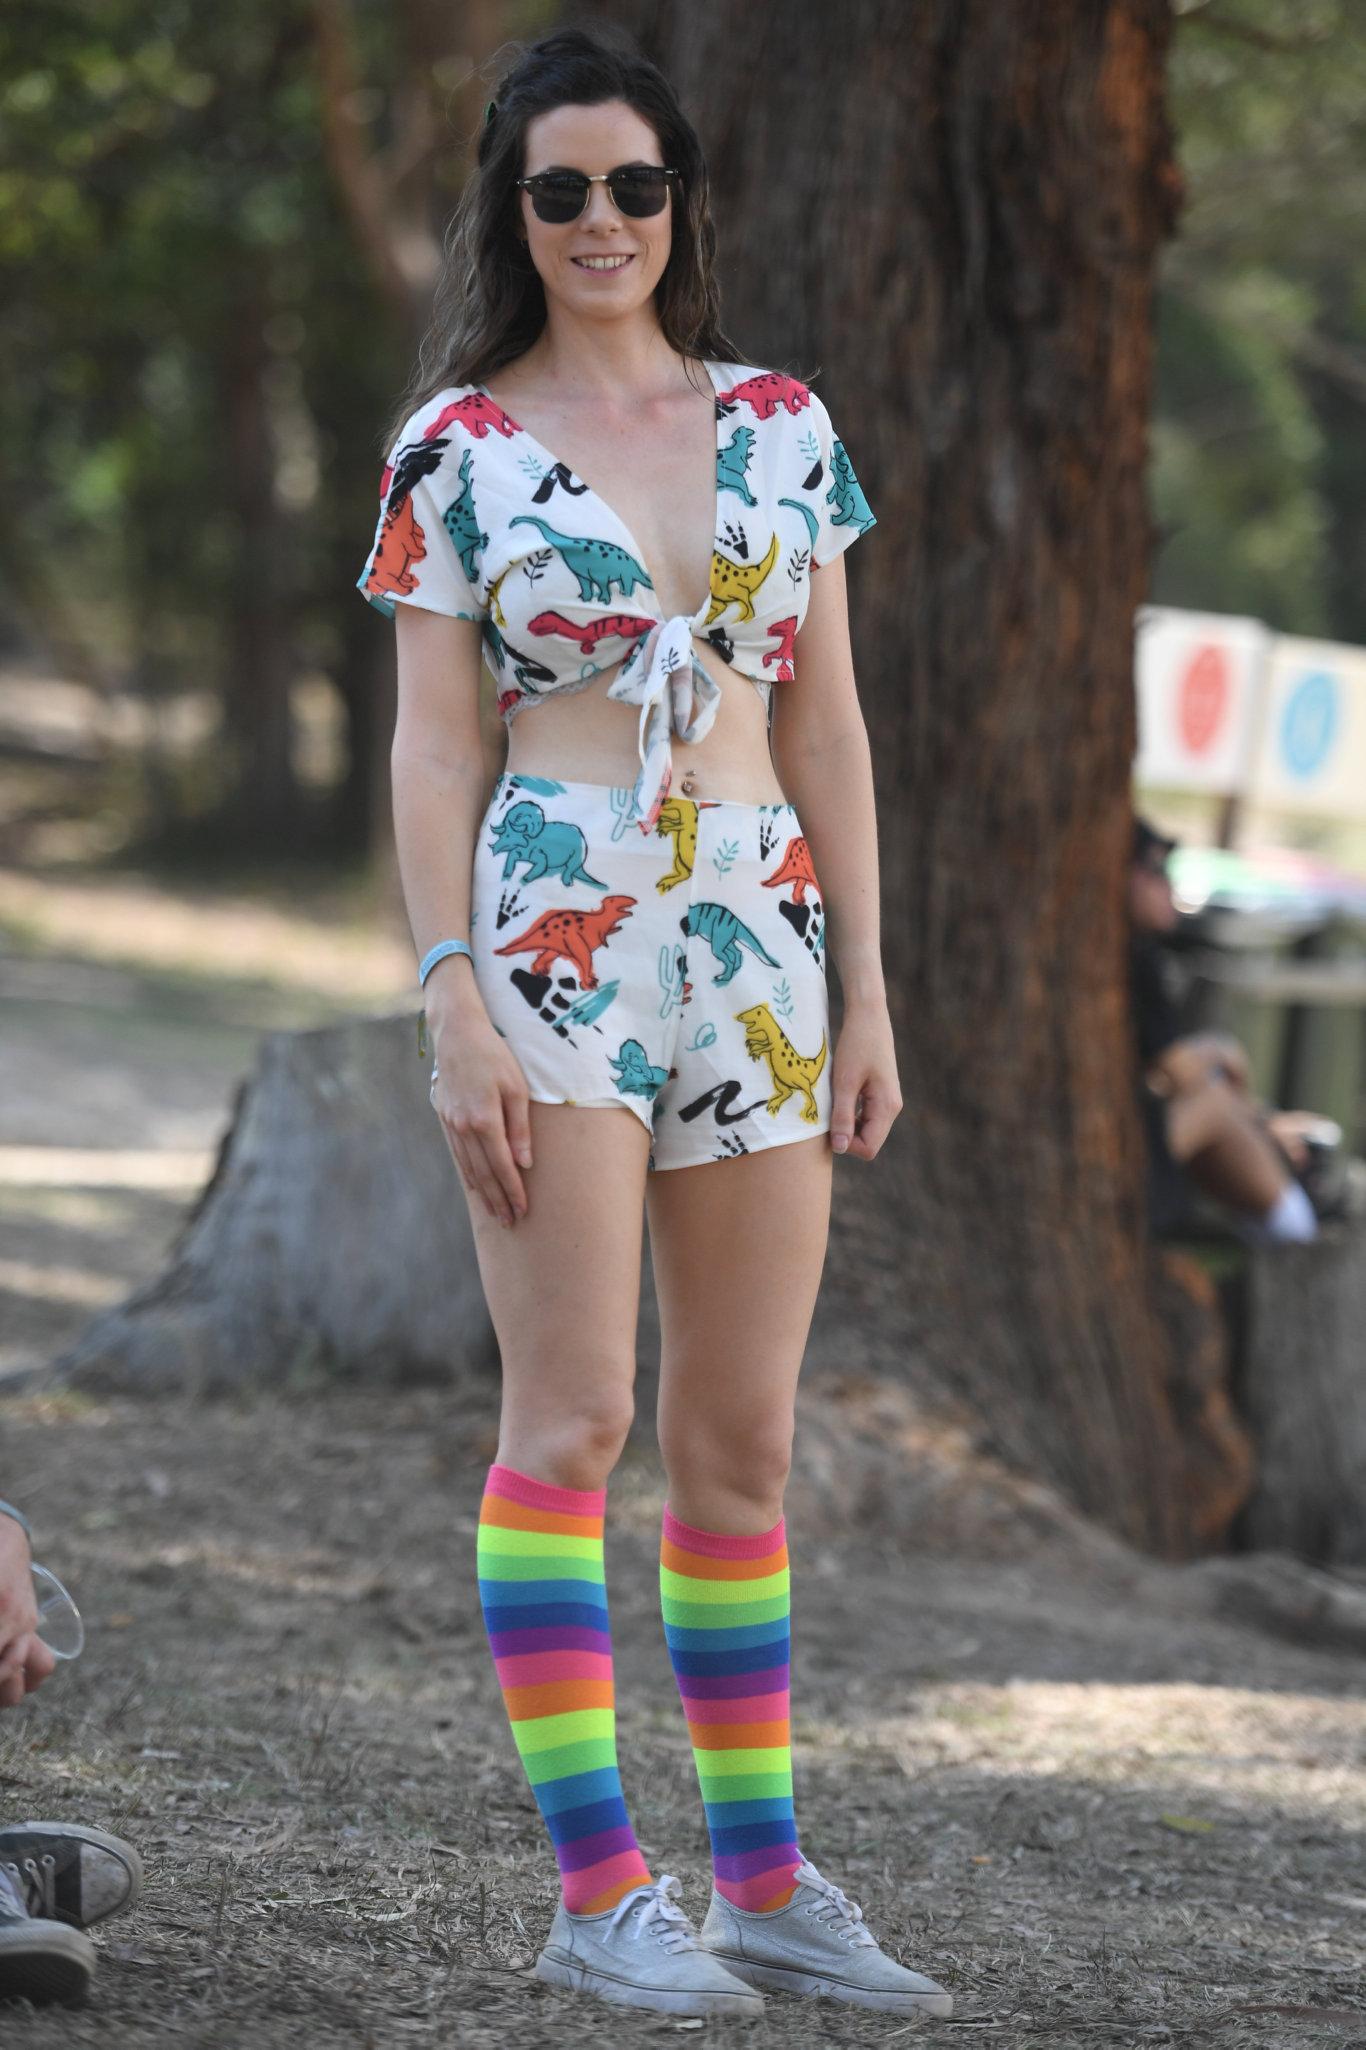 Danielle Stewart, of Brisbane, at Falls Festival with her multicoloured socks.